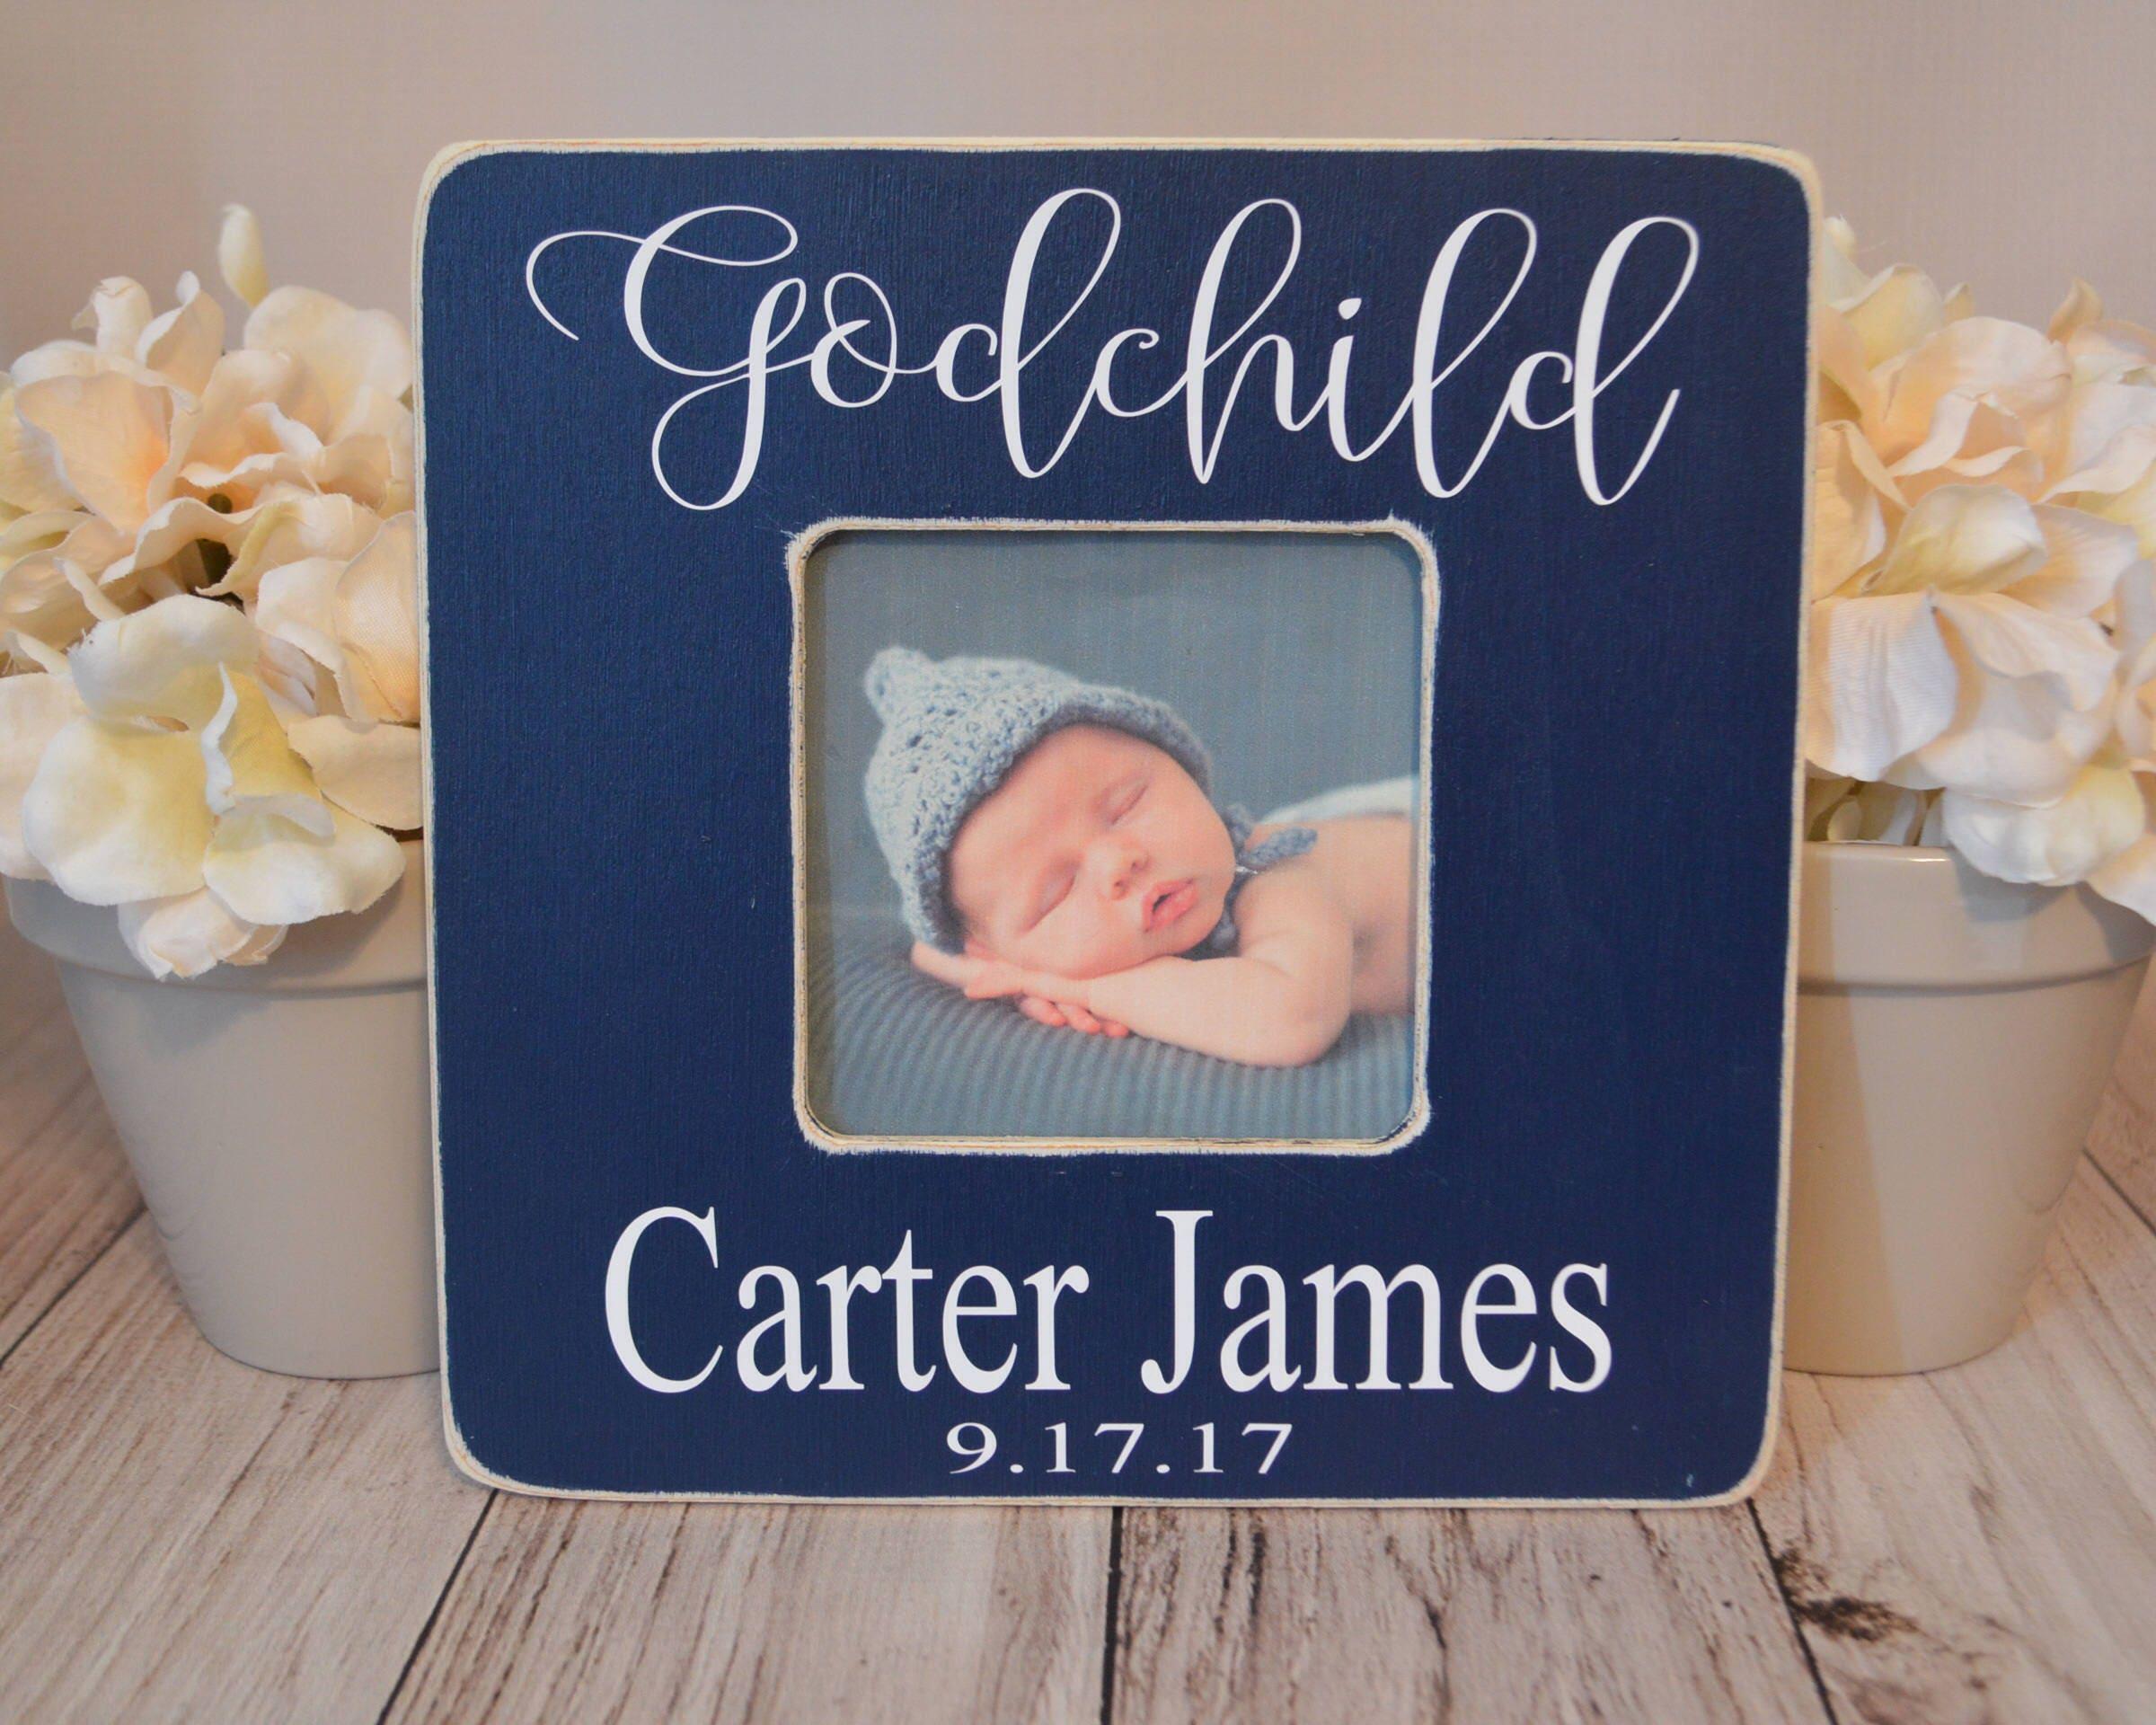 Godchild picture frame Baptism frame custom picture frame | Etsy